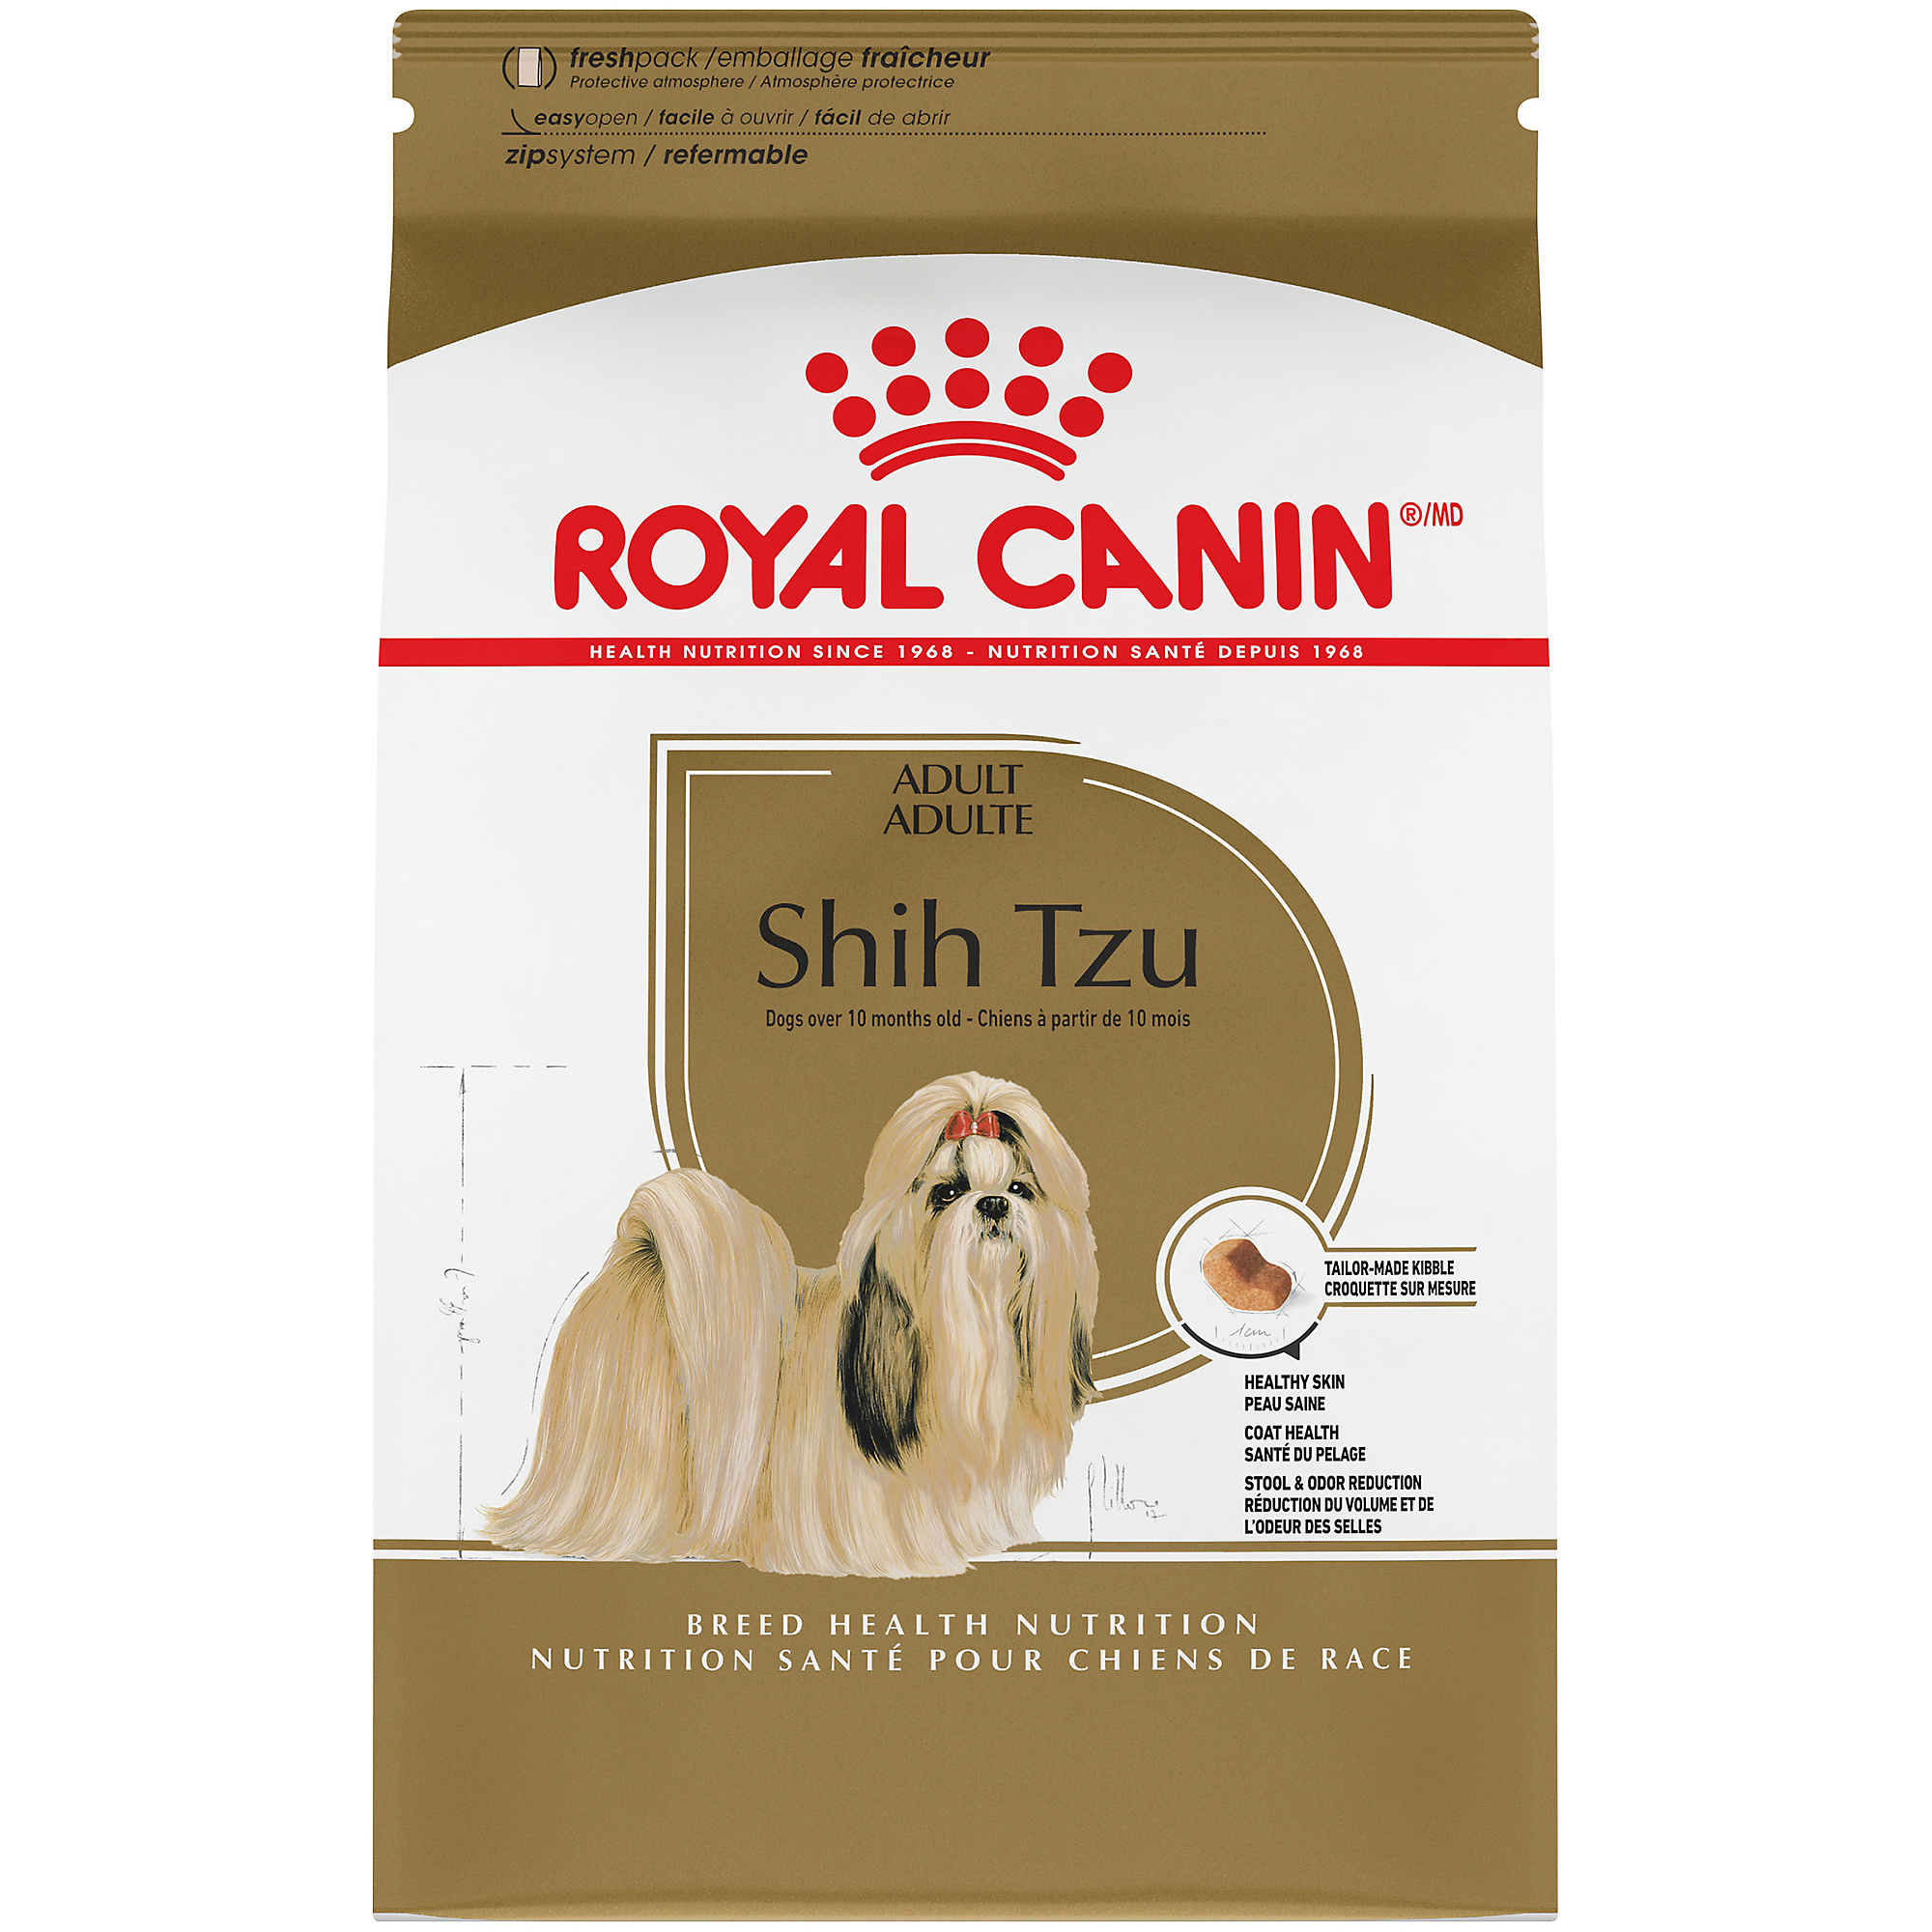 Royal Canin Shih Tzu Adult Dry Dog Food Image